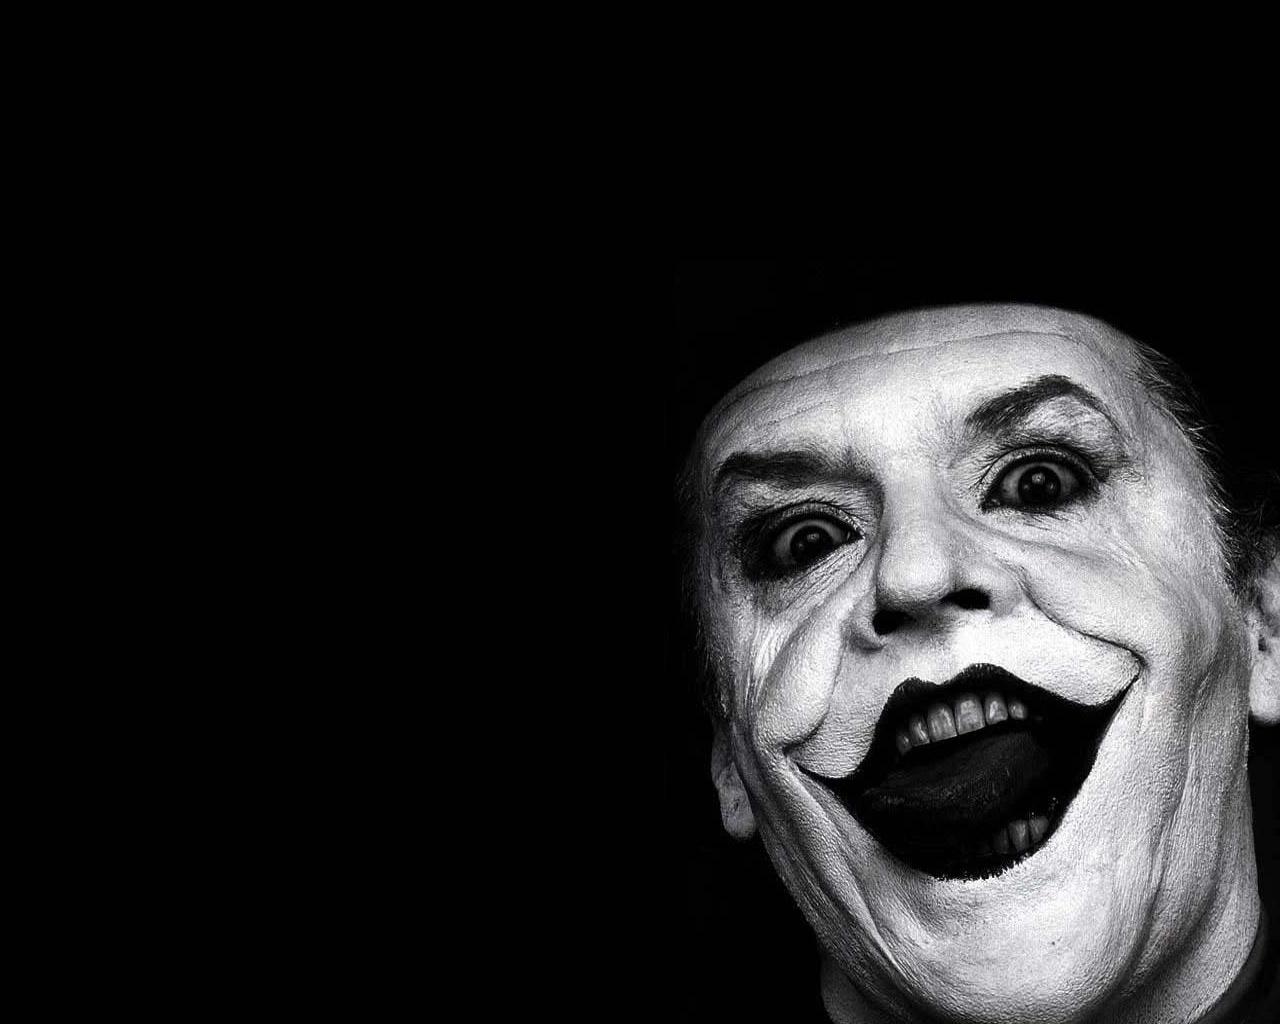 Free Download: Joker & TC - It Ain't Got A Name // Joker - Psychedelic